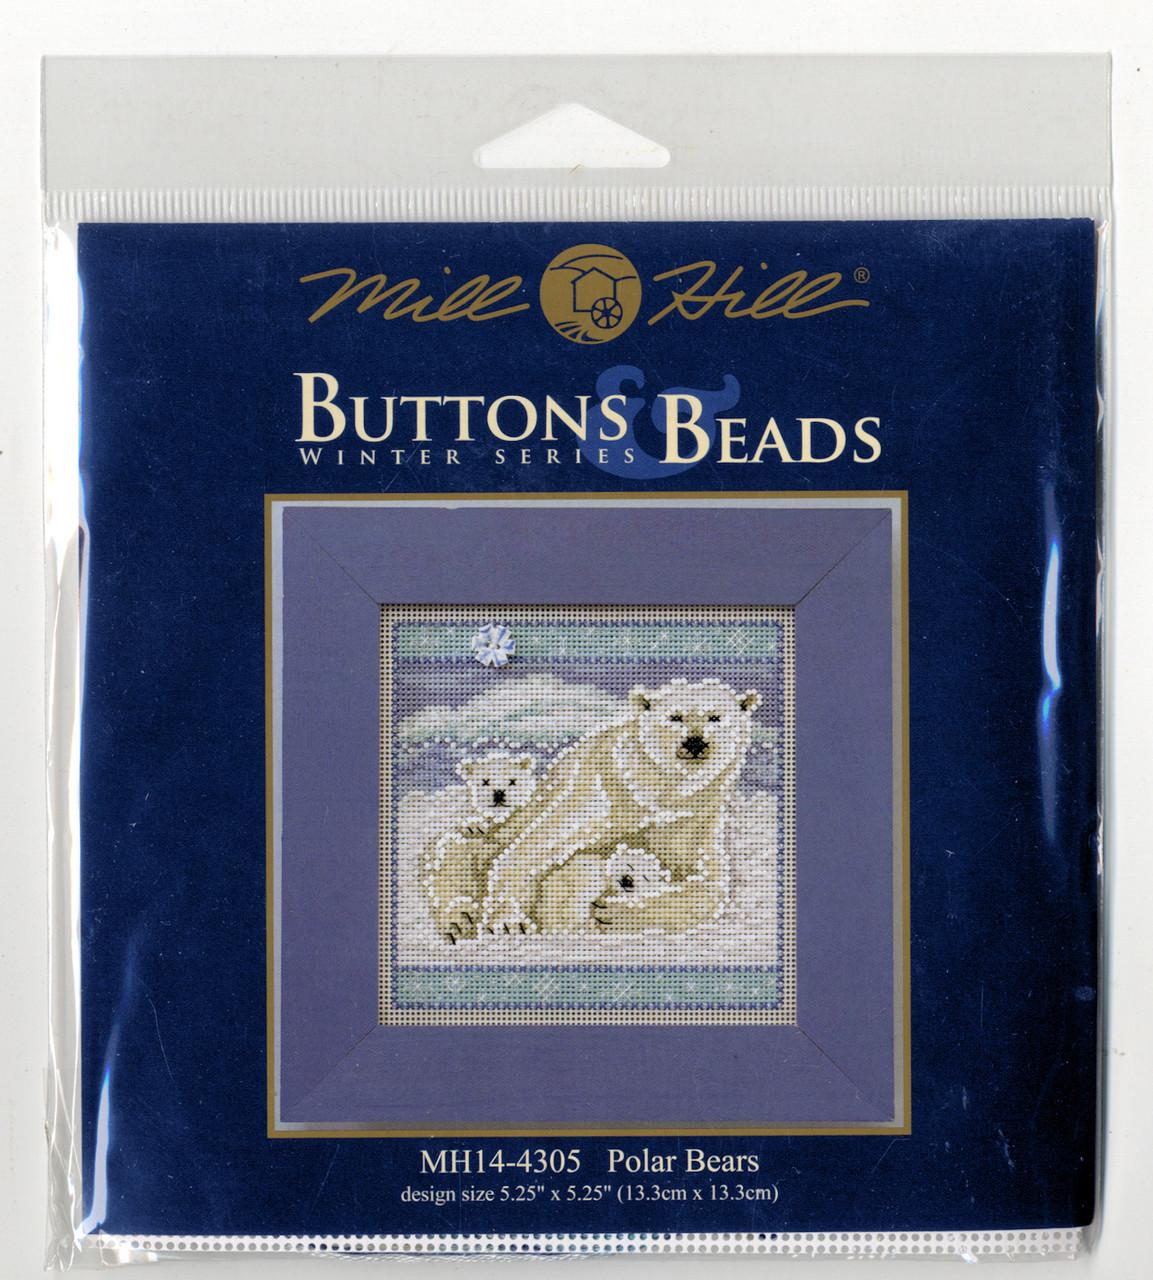 Mill Hill - Polar Bears